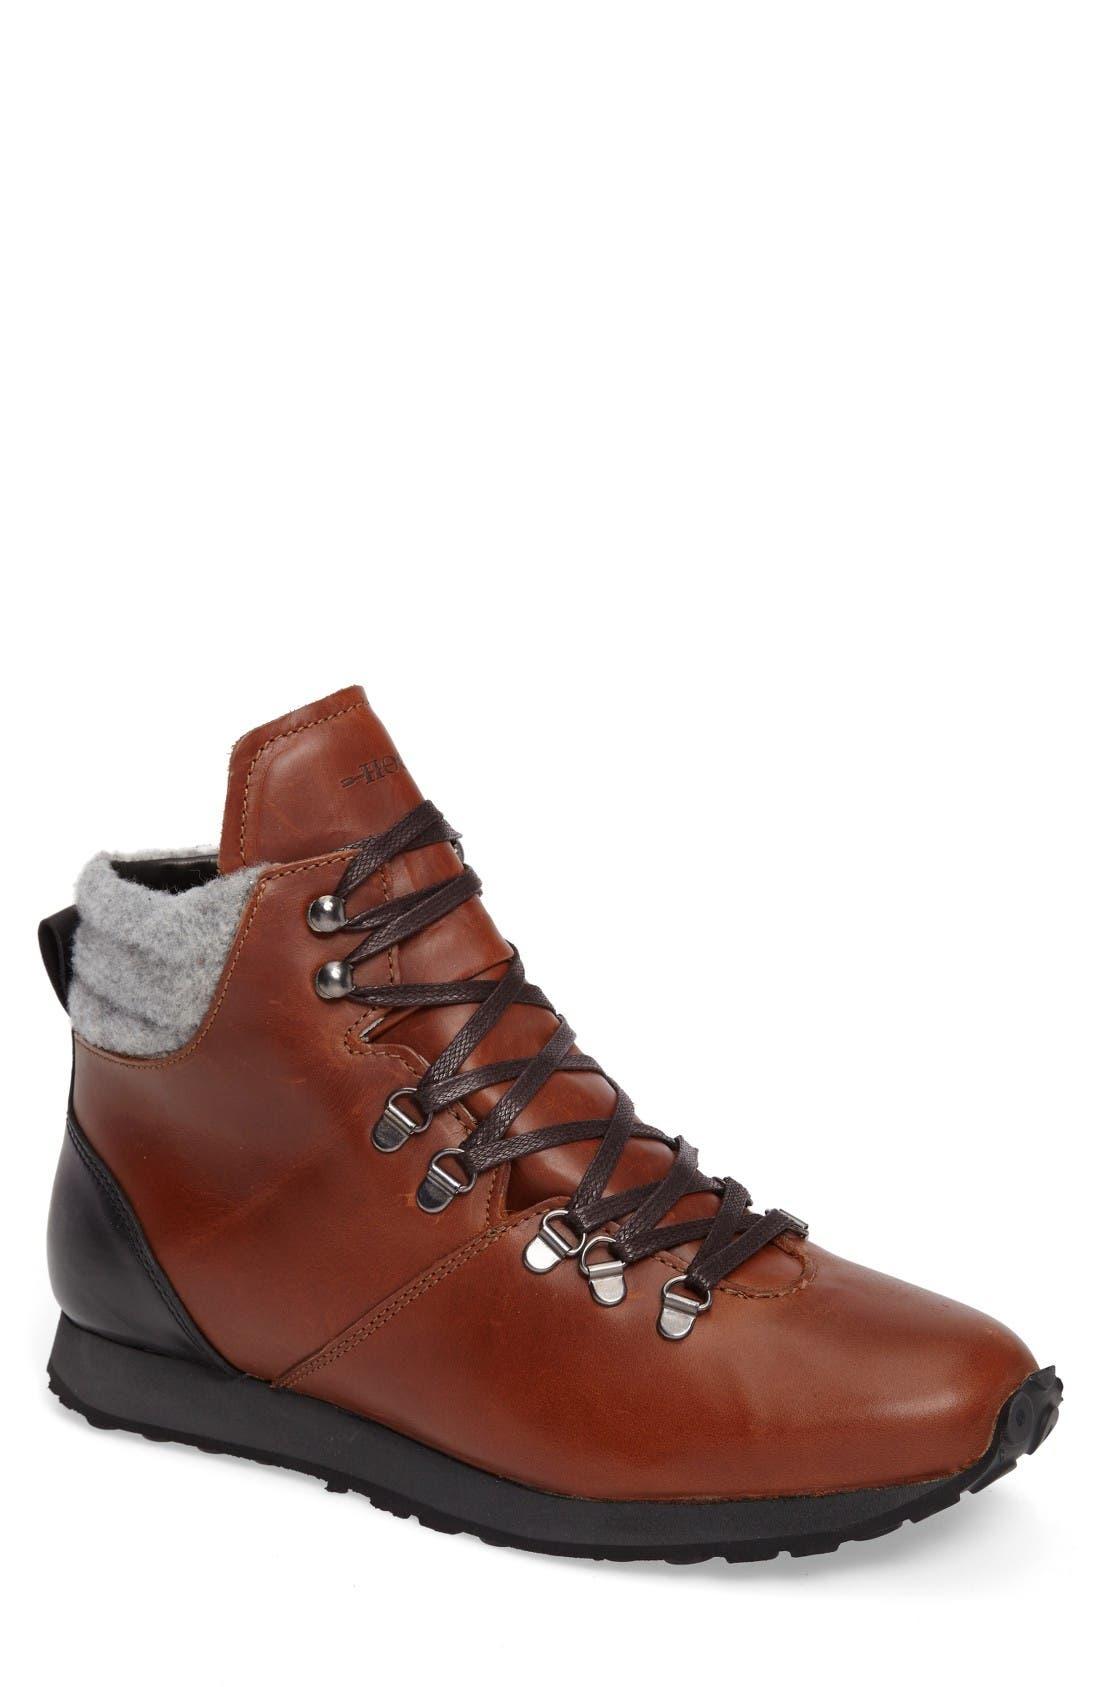 Alternate Image 1 Selected - Hood Rubber Concord Mid Top Wool Cuffed Waterproof Boot (Men)